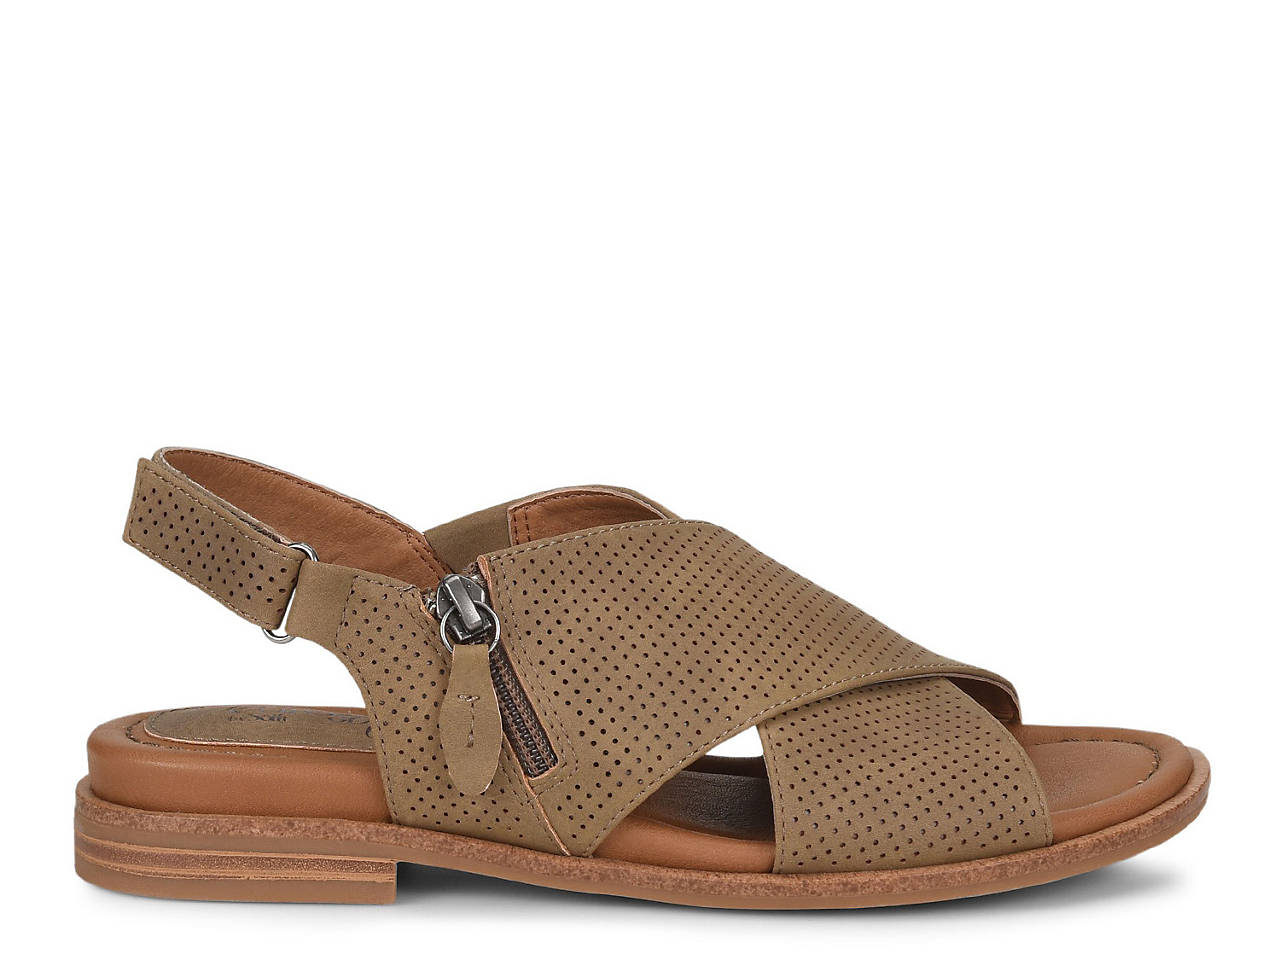 162d7776c705 Eurosoft Darla Sandal Women s Shoes